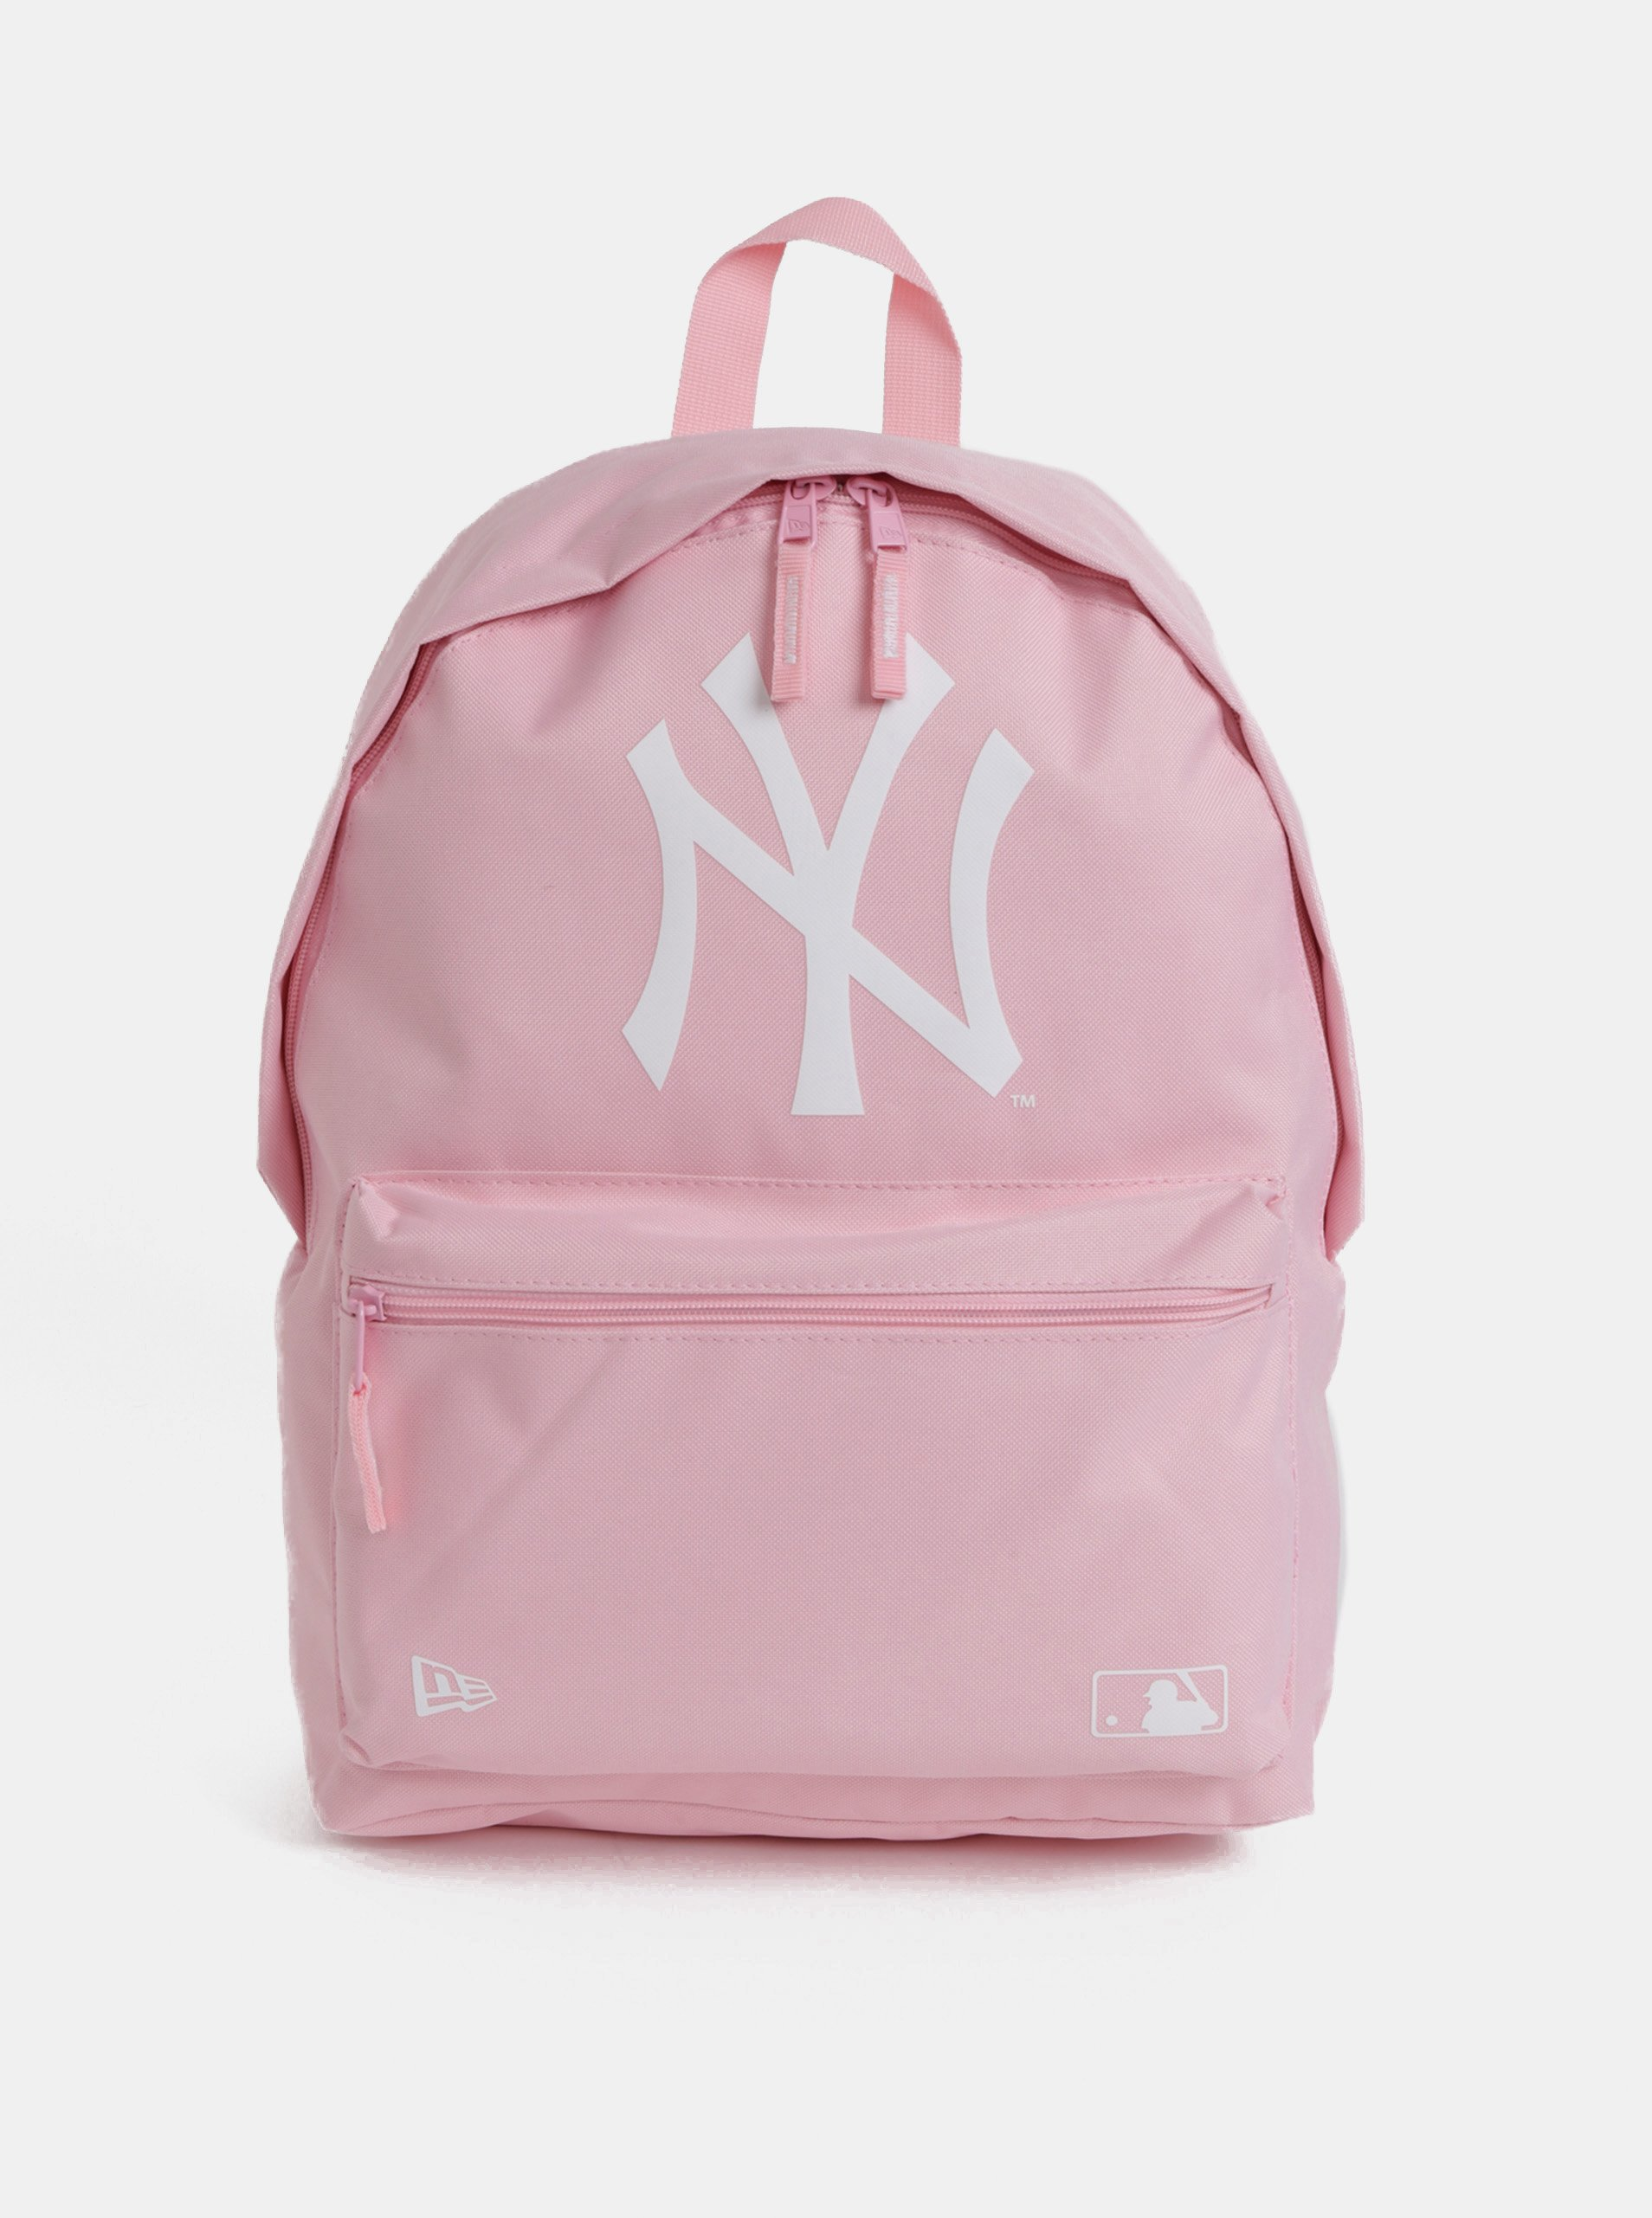 078e1b50b5 Růžový dámský batoh New Era Neyyan